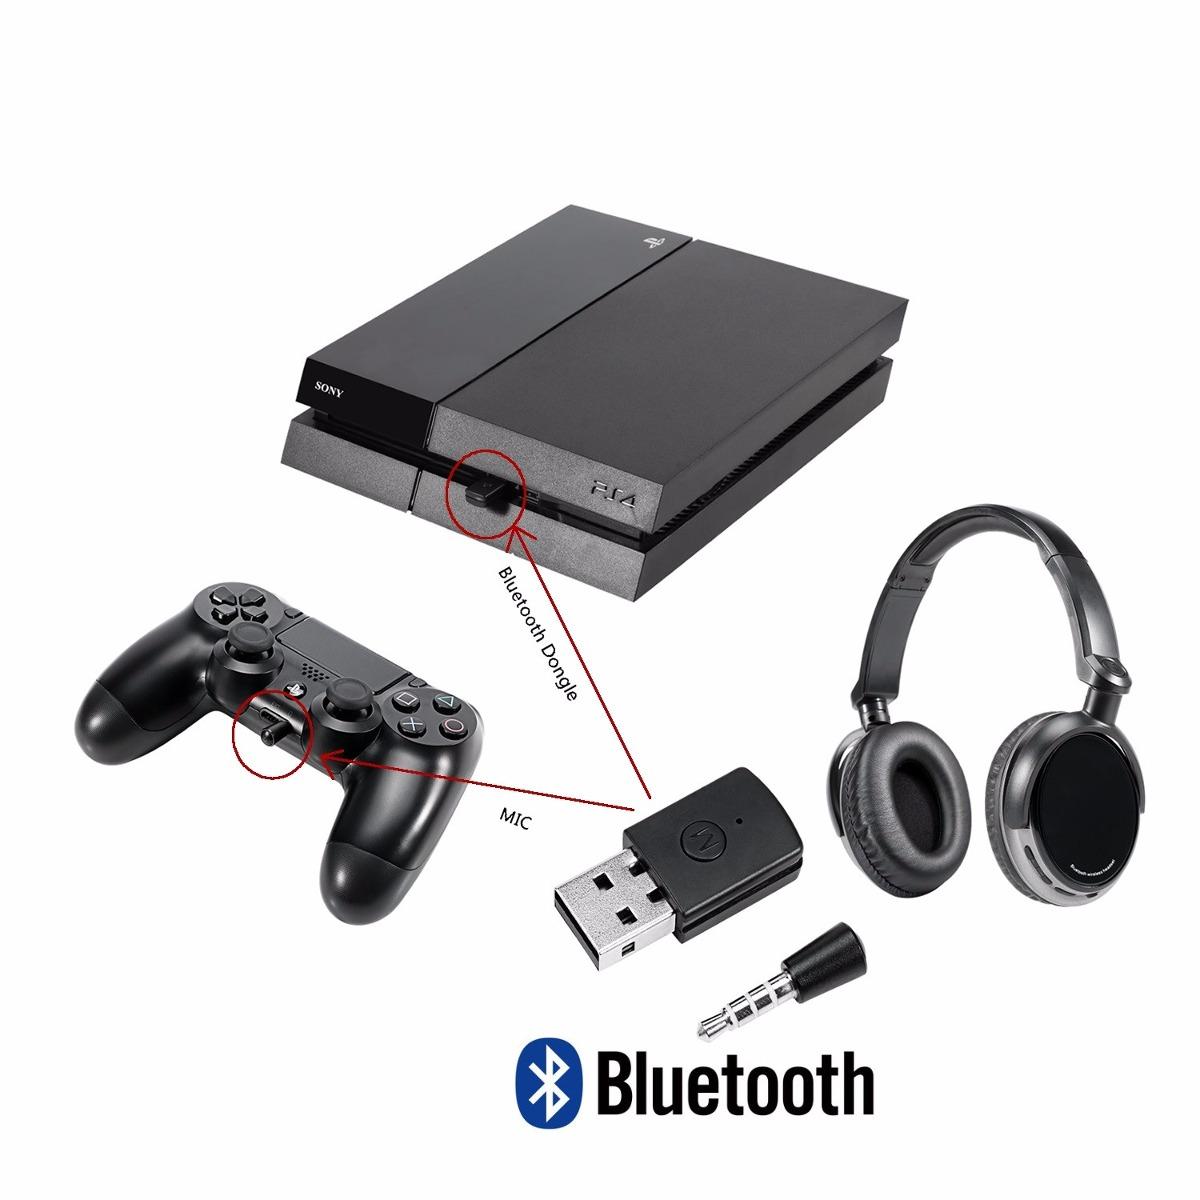 transmissor bluetooth para ps4 pc use headset sem fio. Black Bedroom Furniture Sets. Home Design Ideas